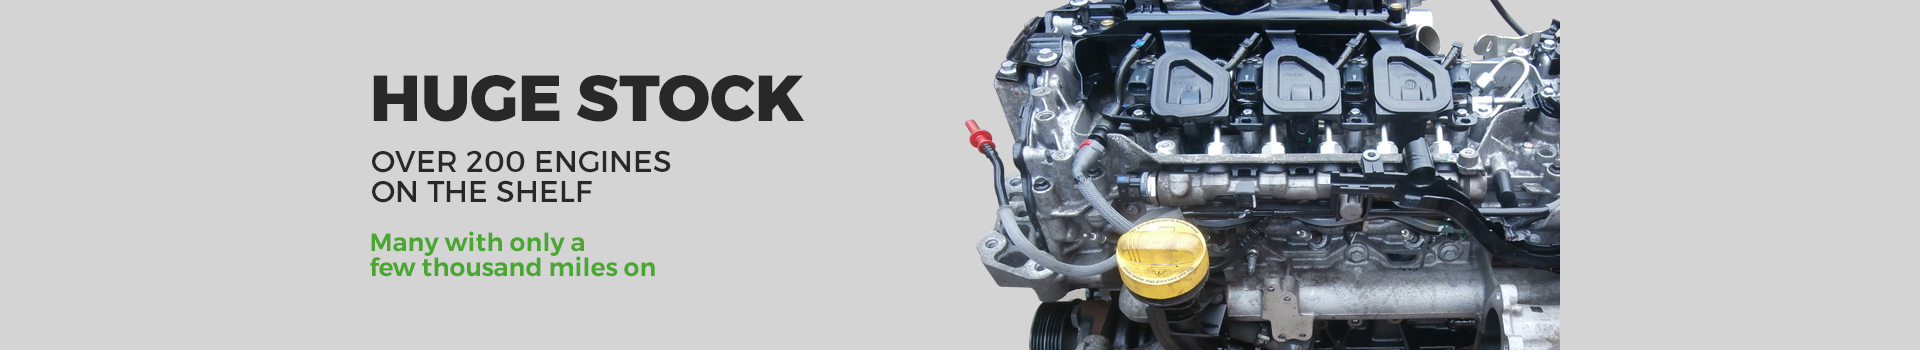 "ISUZU NQR 7.5 TON 4.8 TD INJECTOR FOR ENGINE CODE /""4HE1.XS/"""